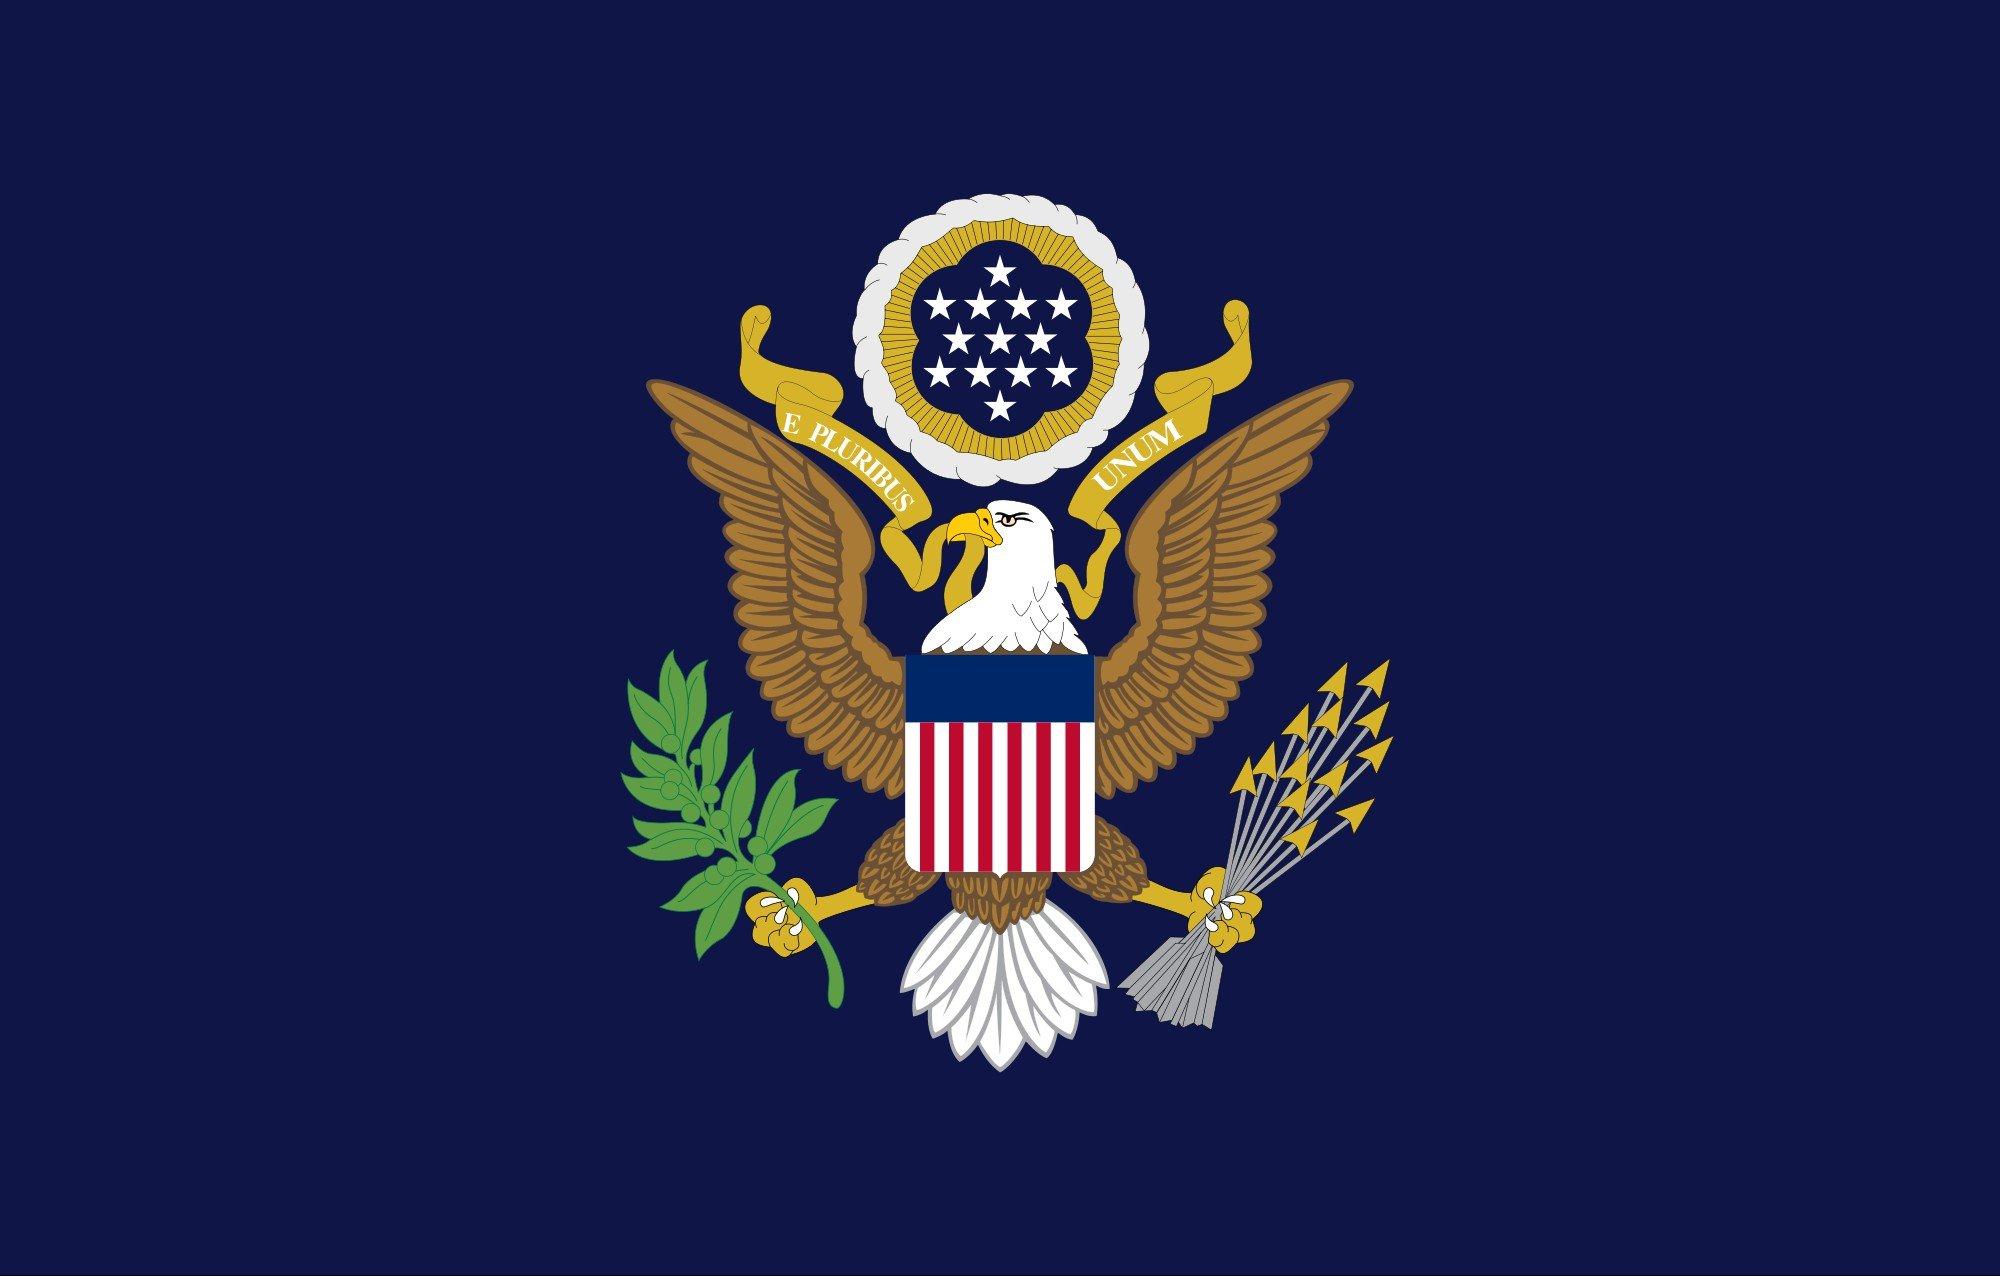 2000pxus presidential flag navy 1899svg wallpaper